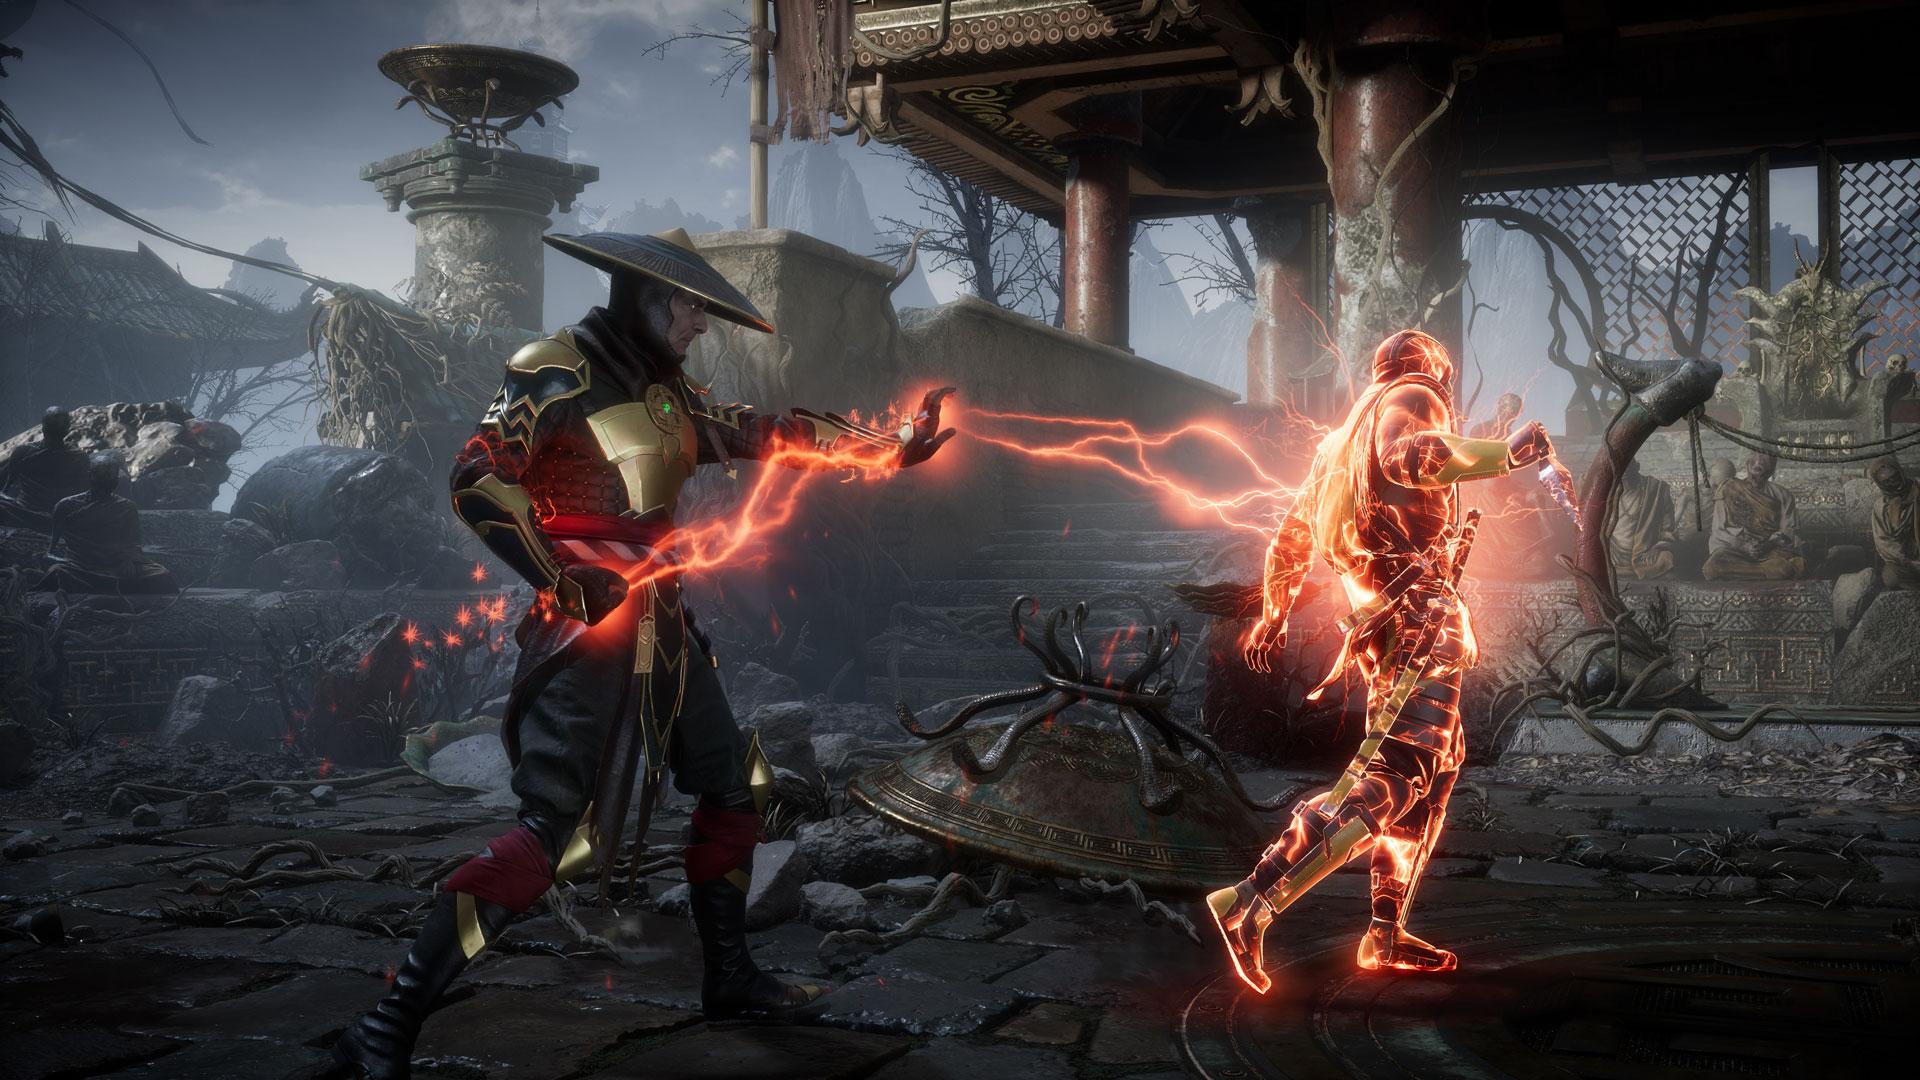 Link Tải Game Mortal Kombat 11 Miễn Phí